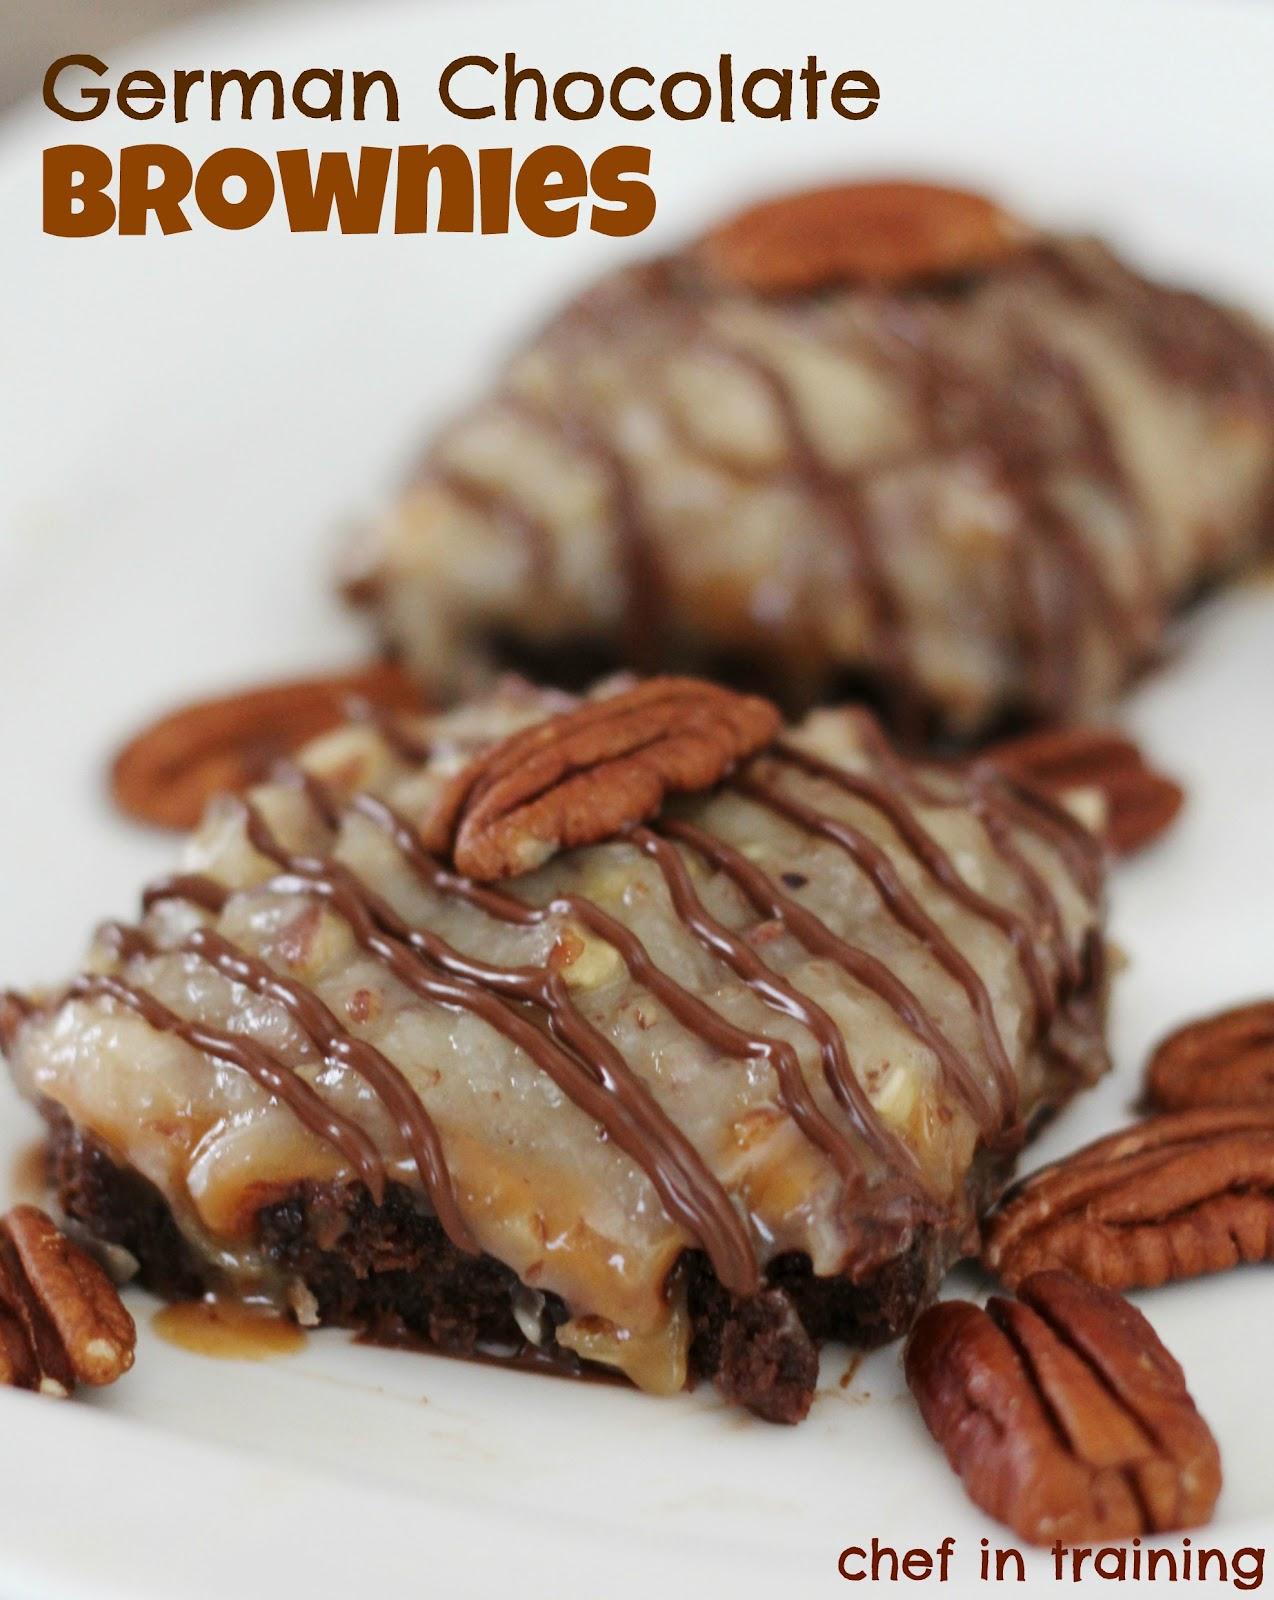 German Chocolate Brownies - Chef in Training